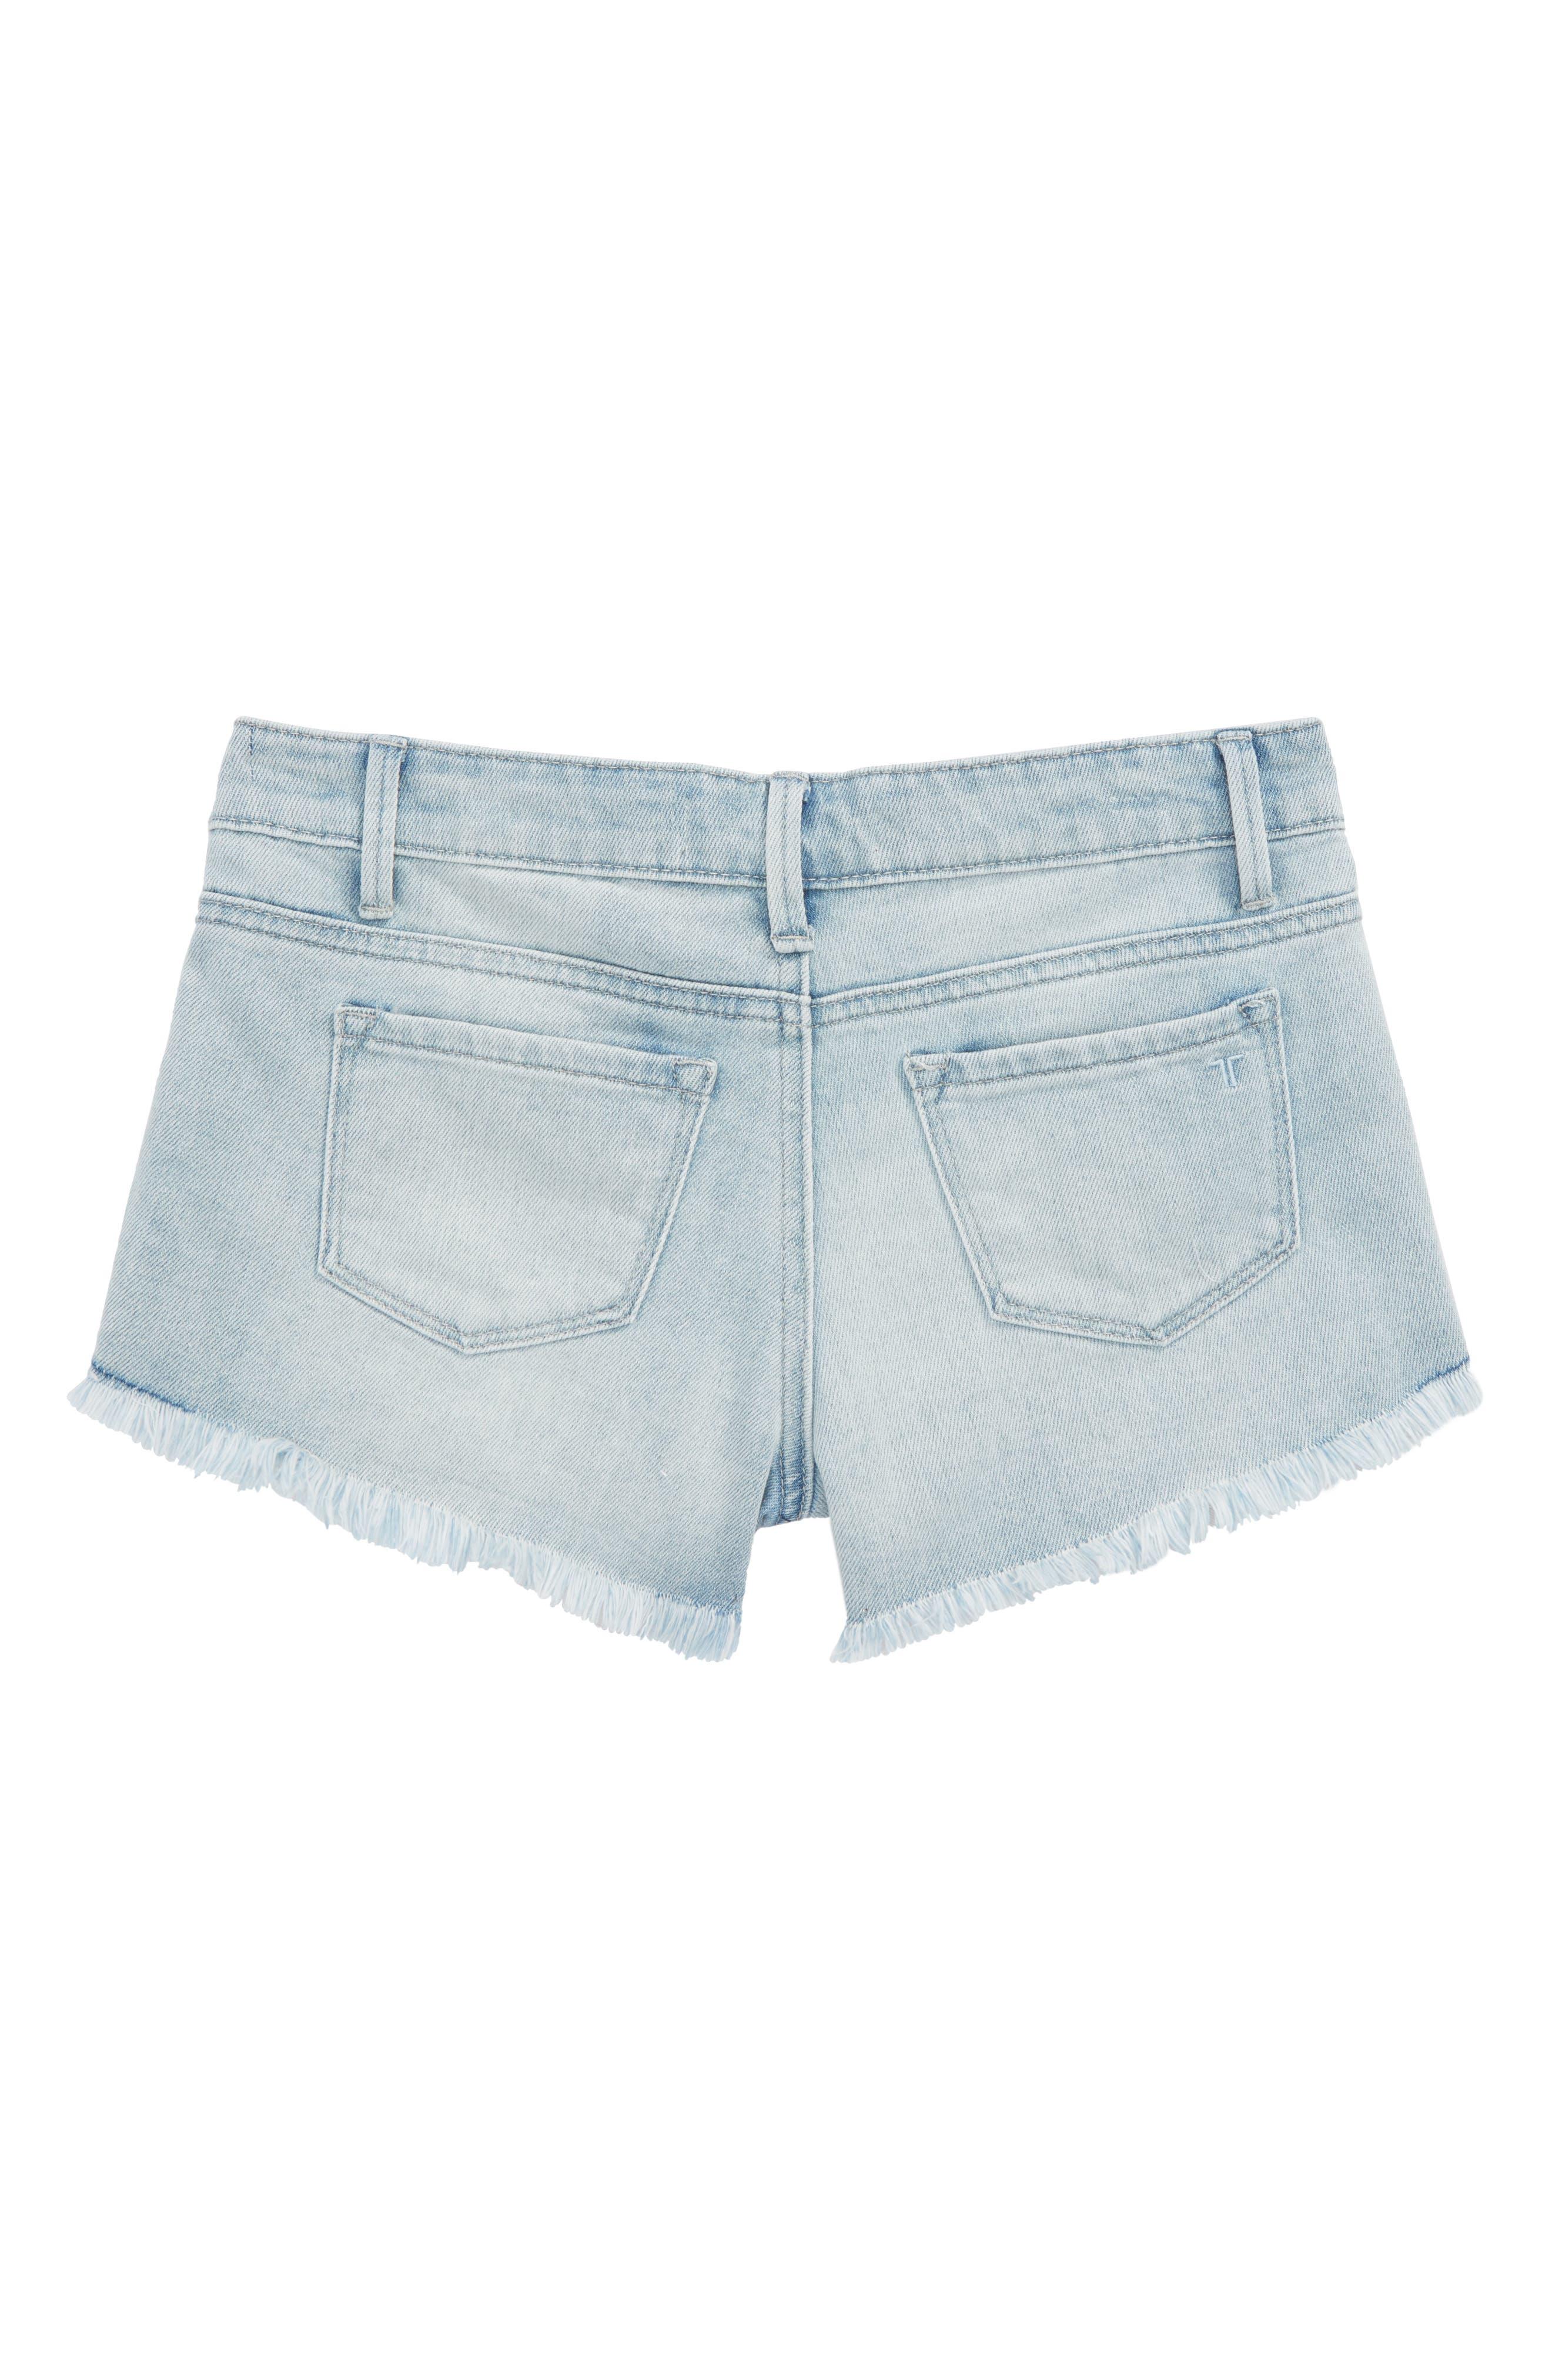 Lace Denim Shorts,                             Alternate thumbnail 2, color,                             400